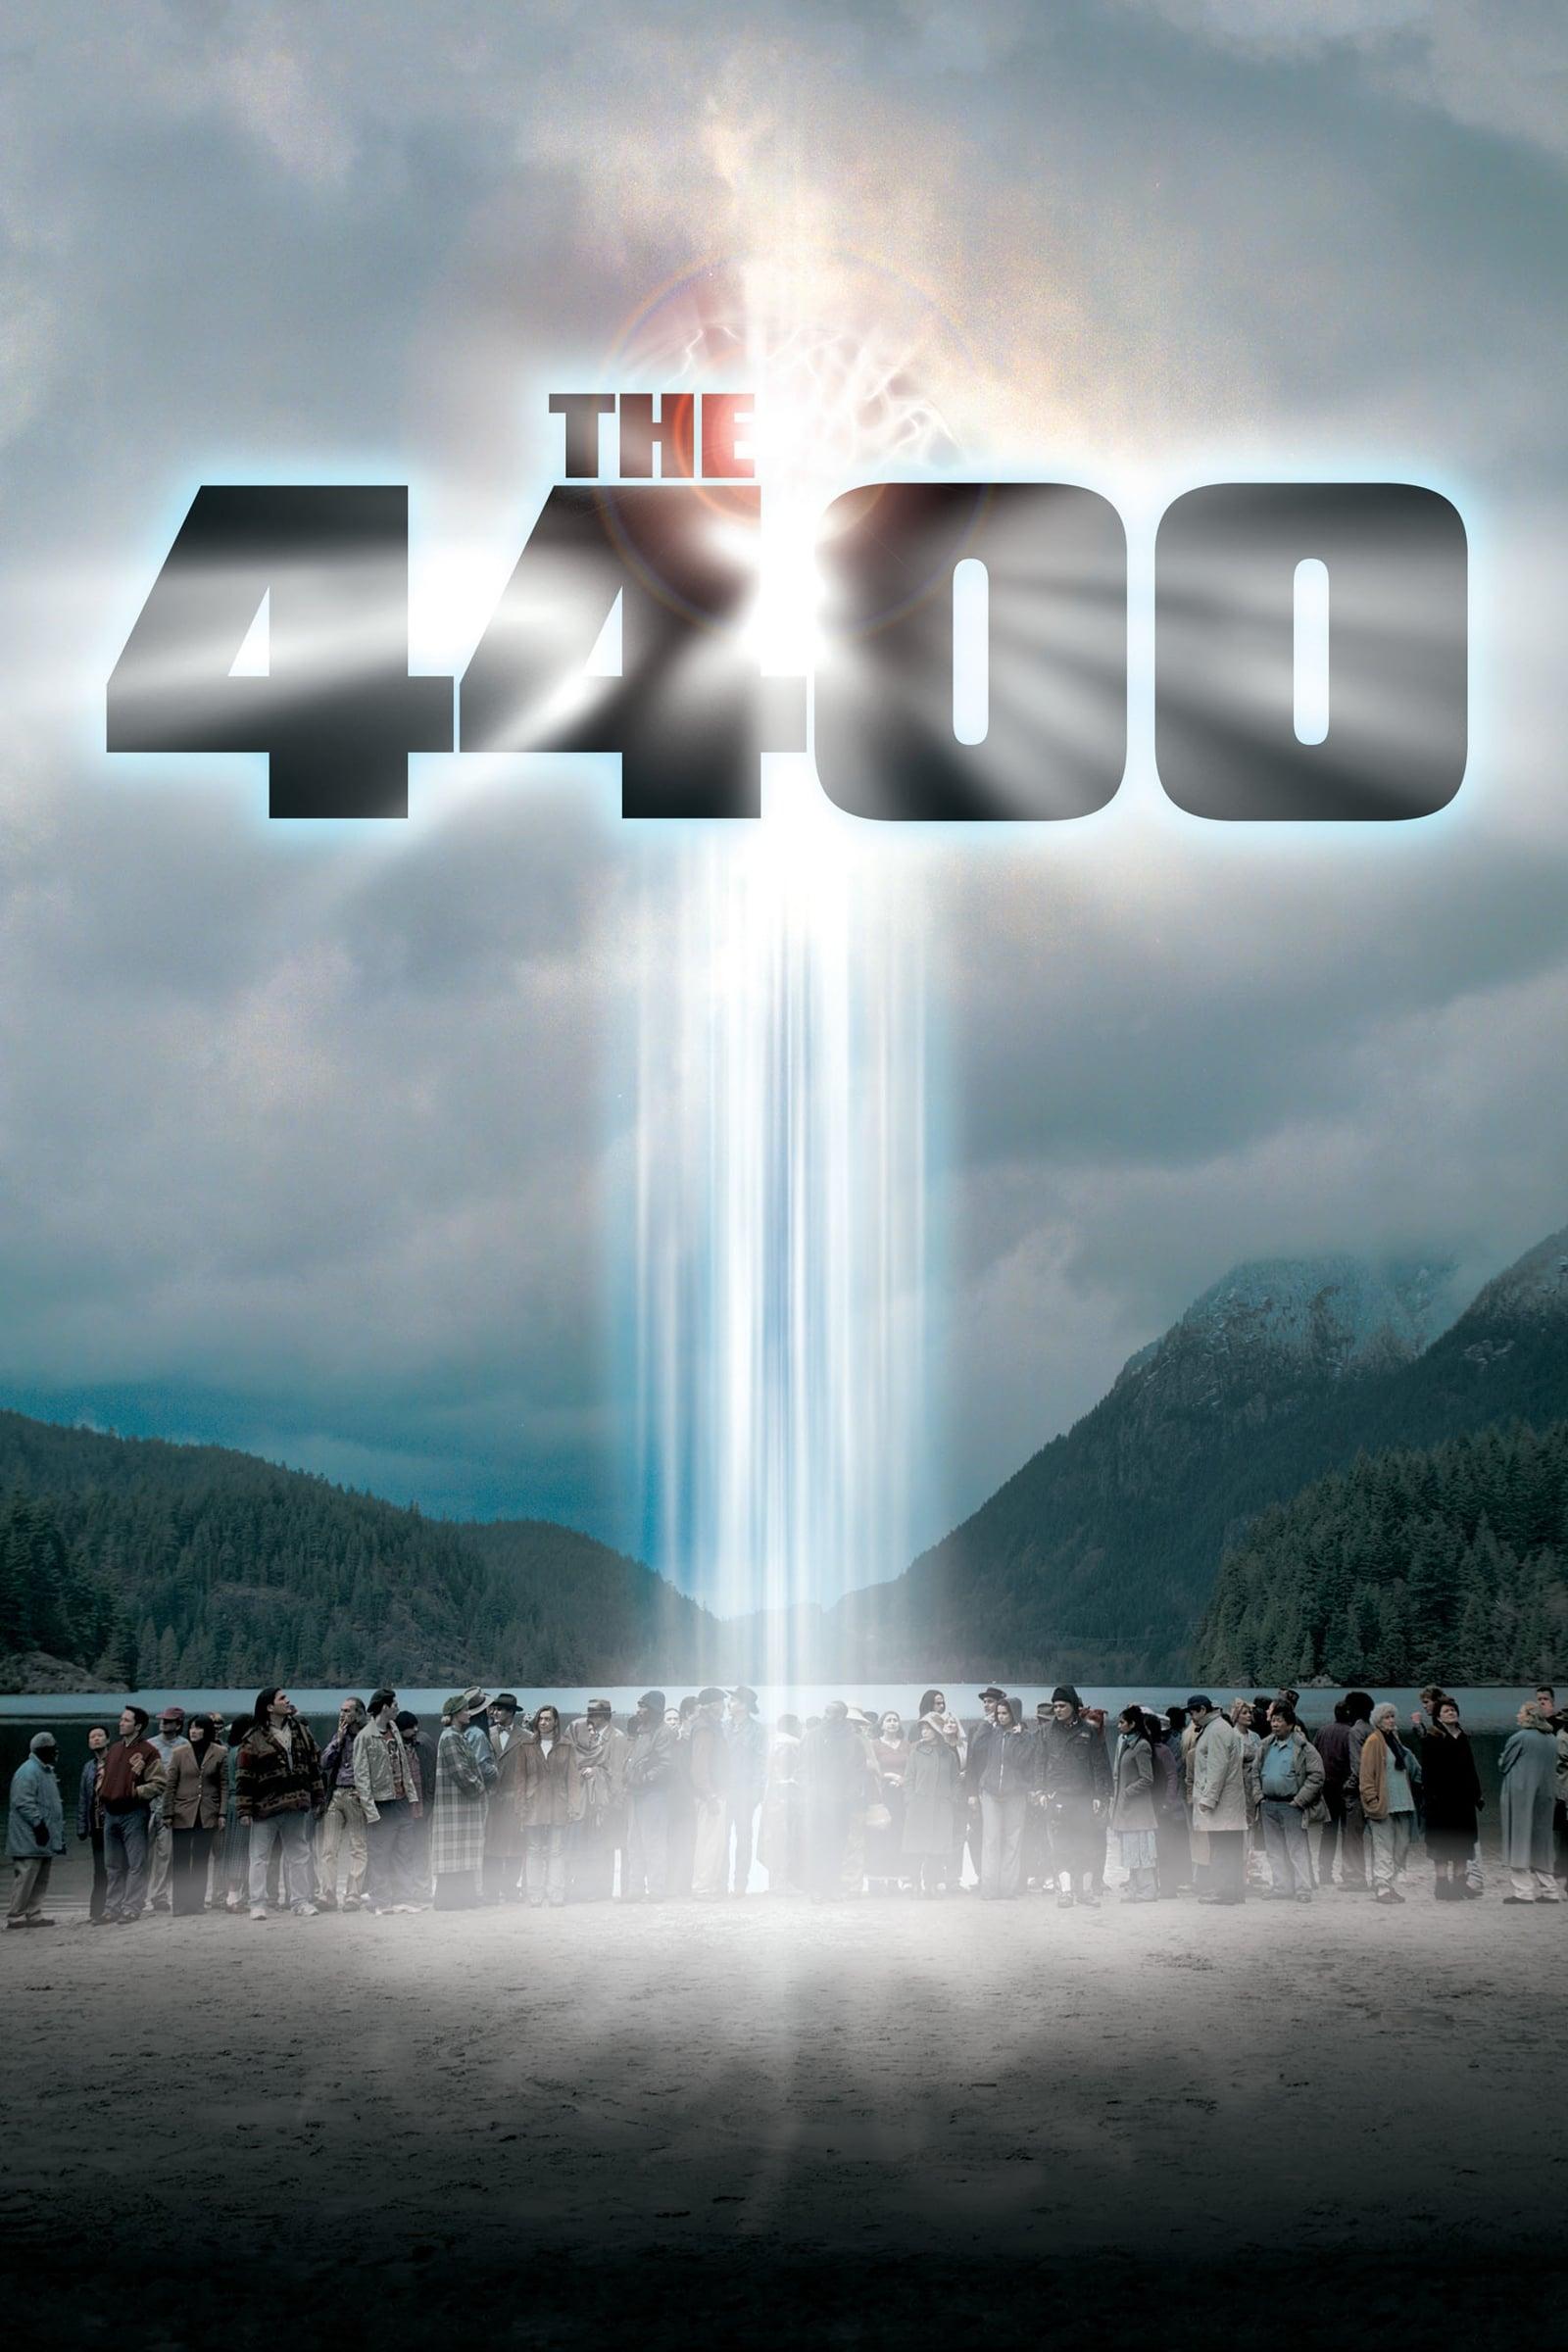 Os 4400